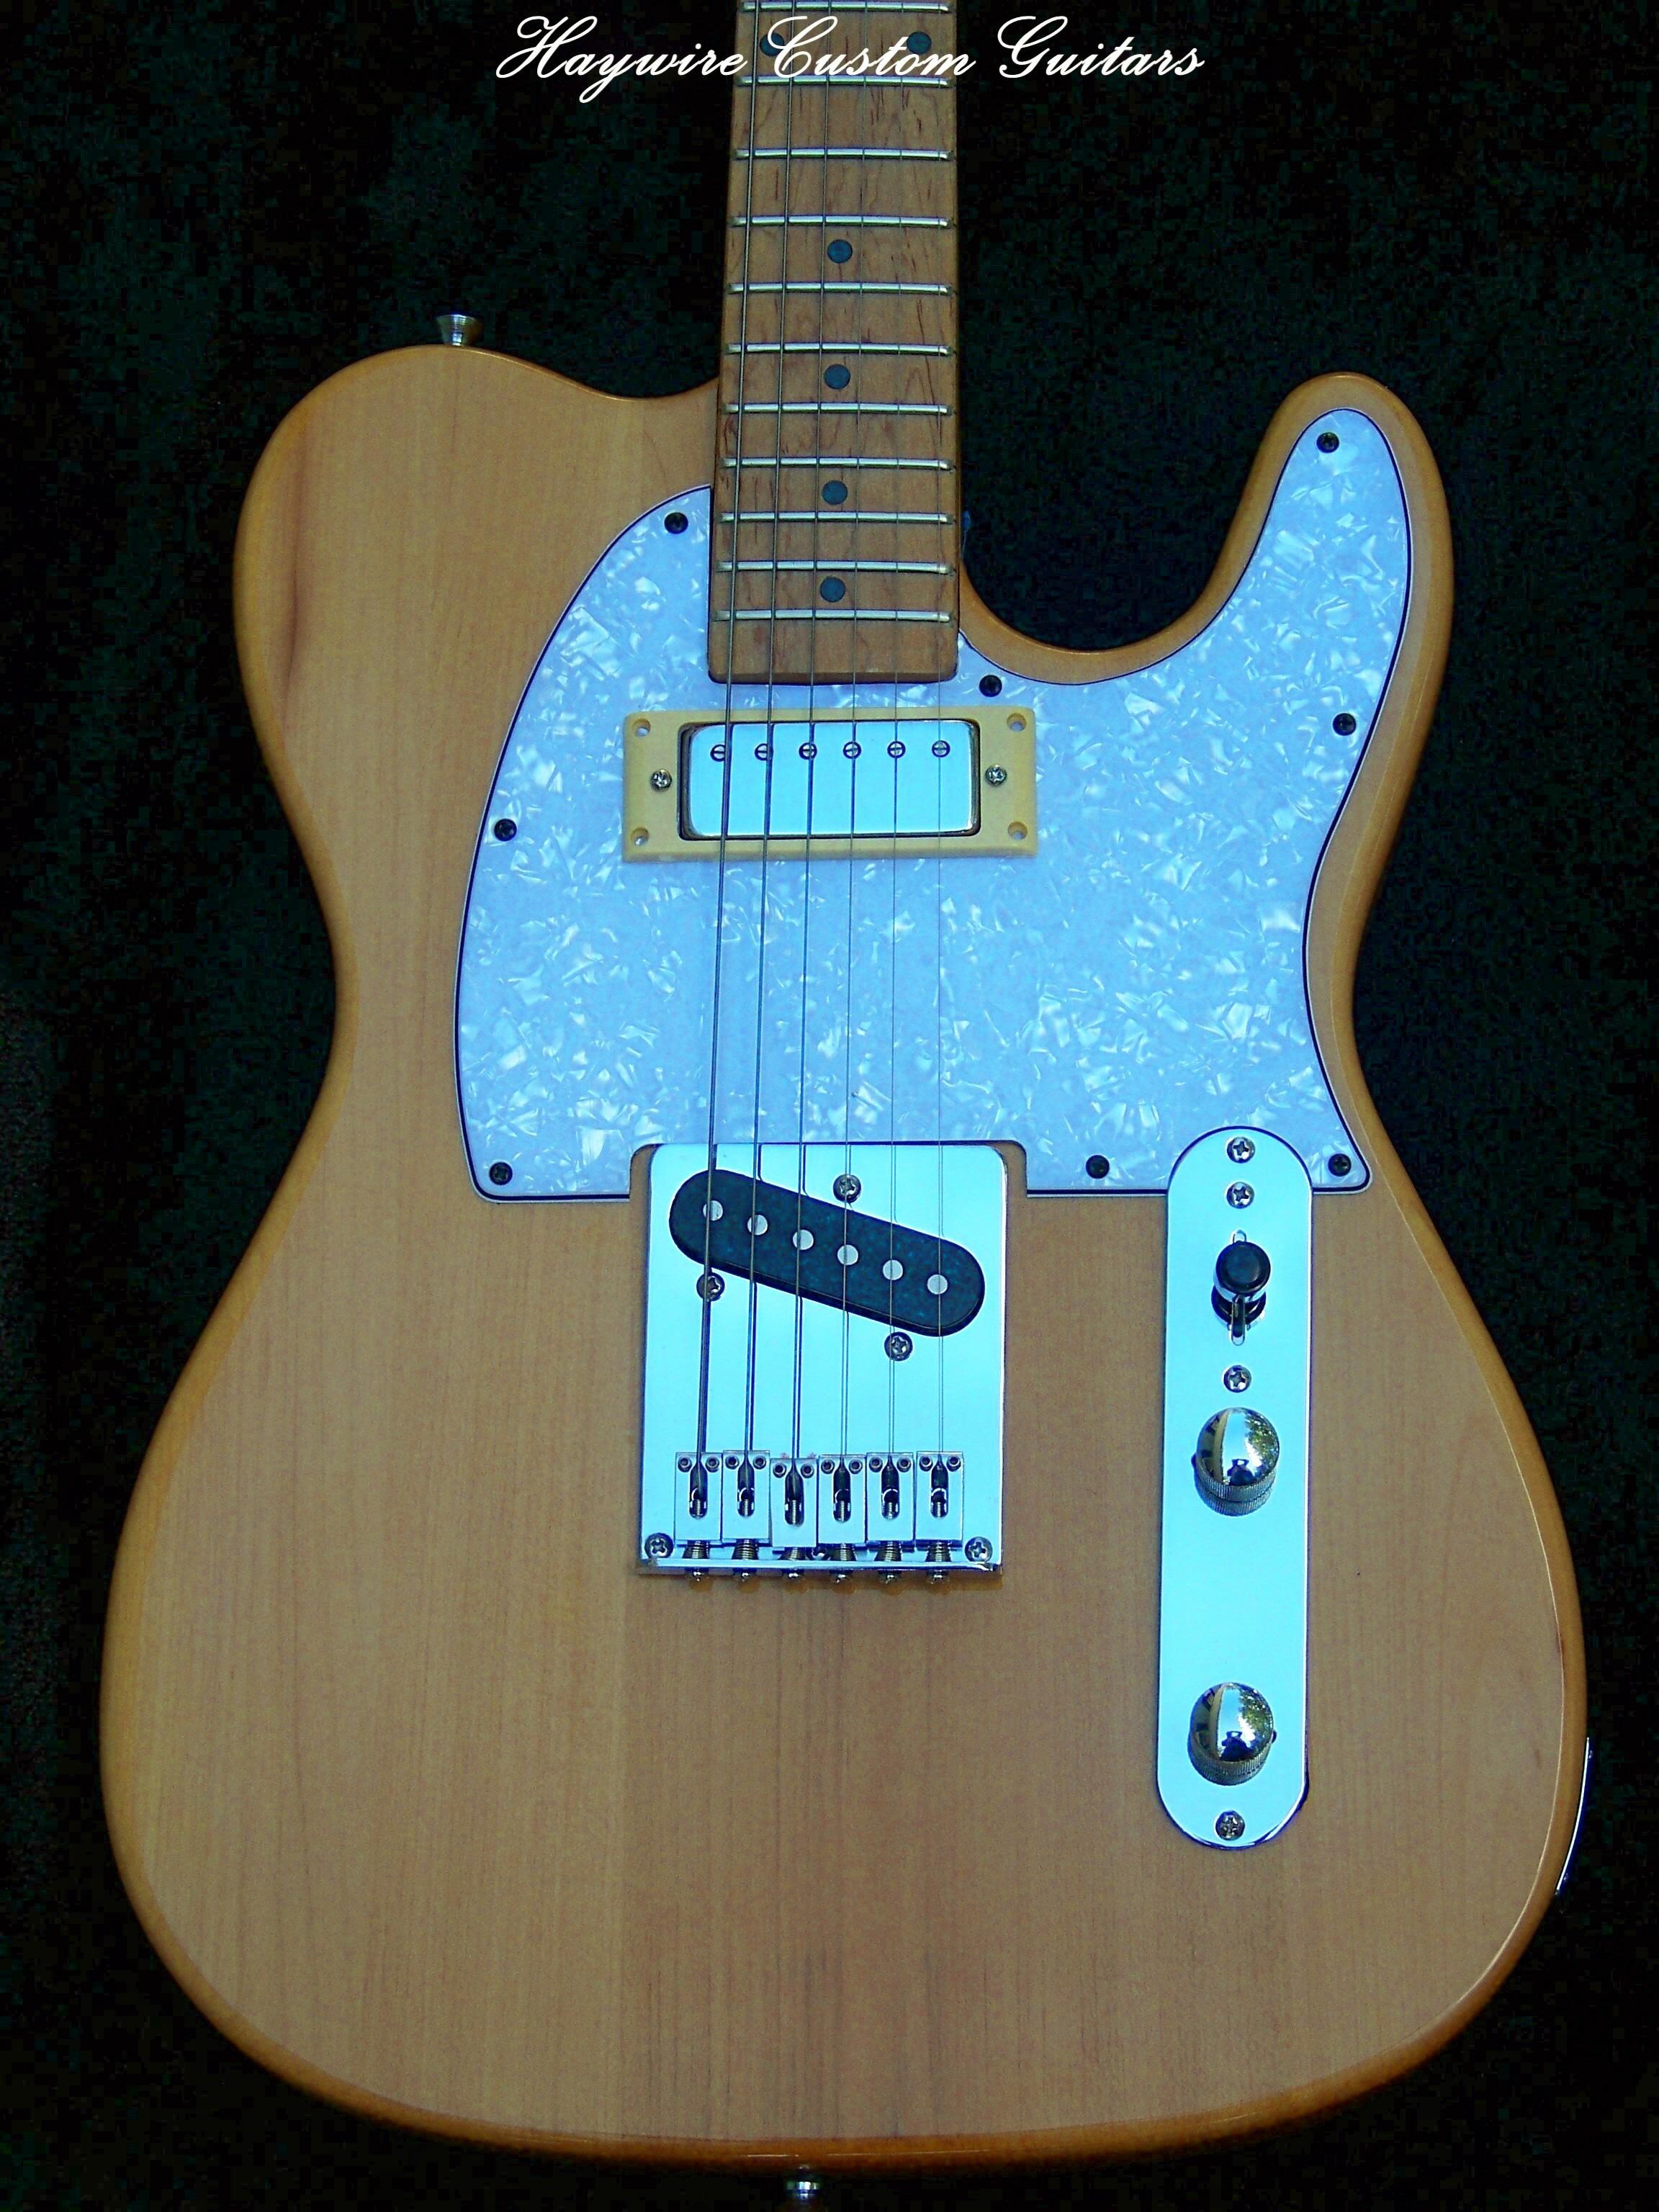 Haywire Custom Guitars P-90 T Deluxe